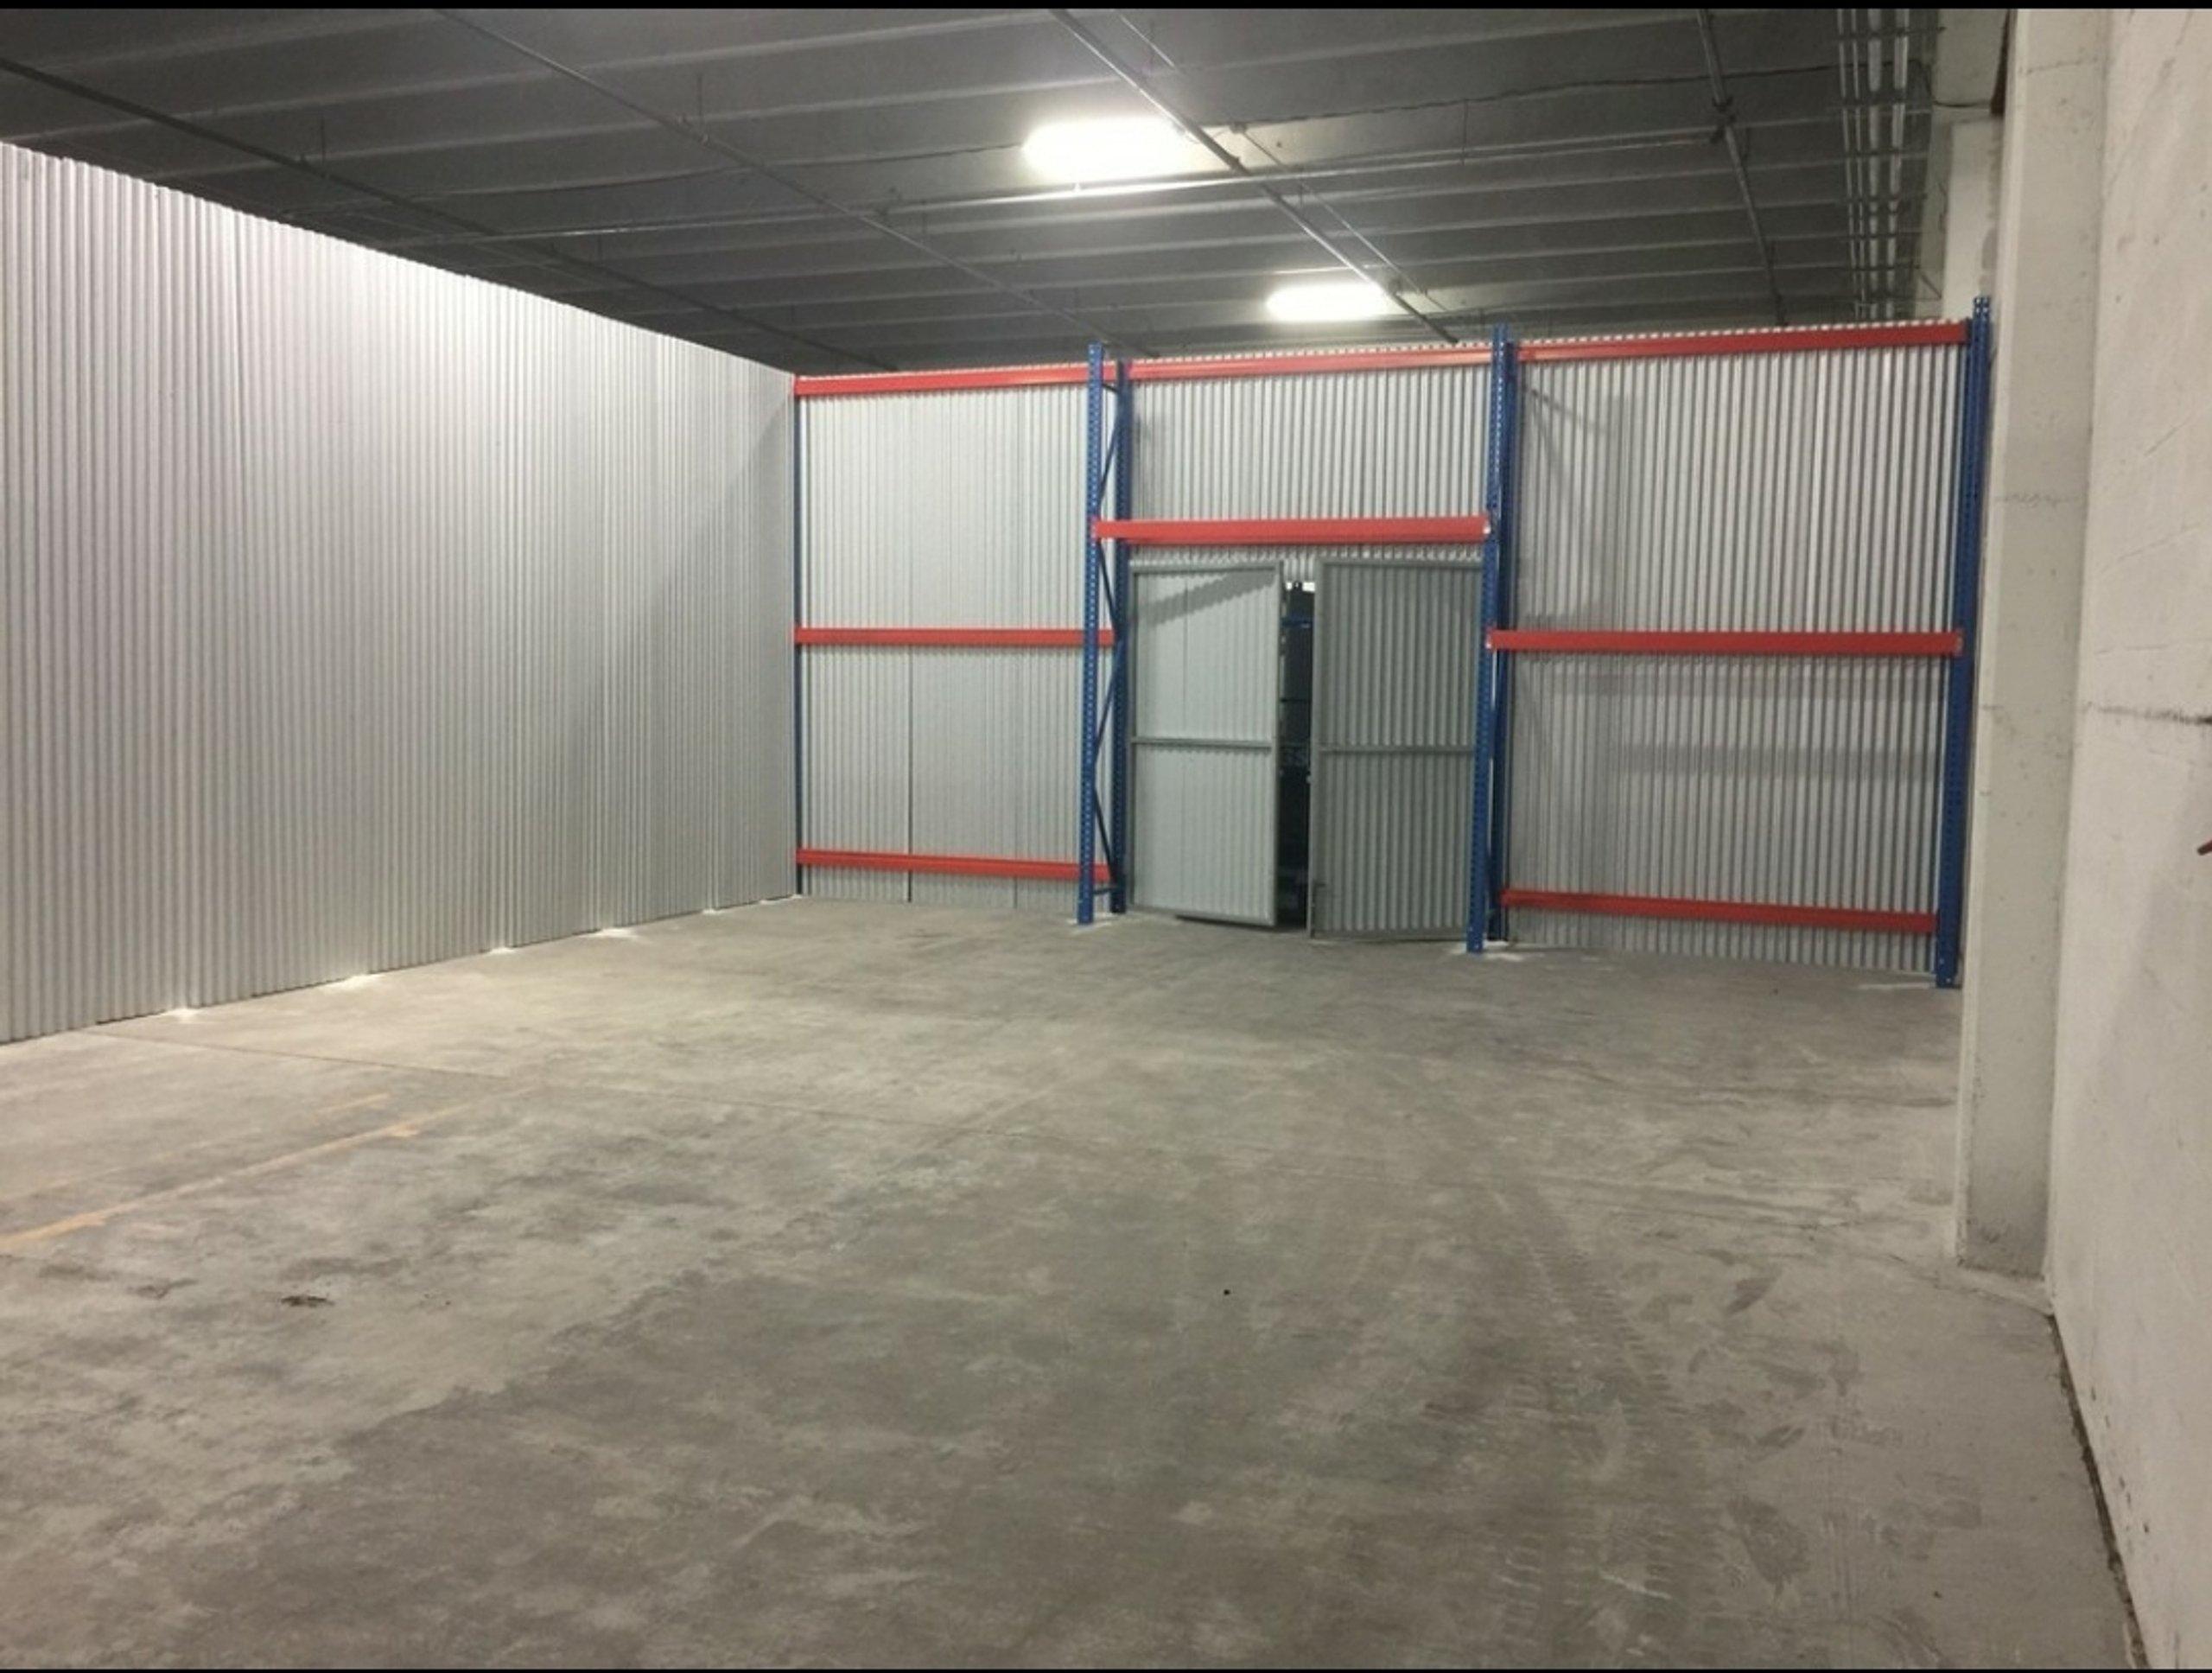 30x16 Warehouse self storage unit